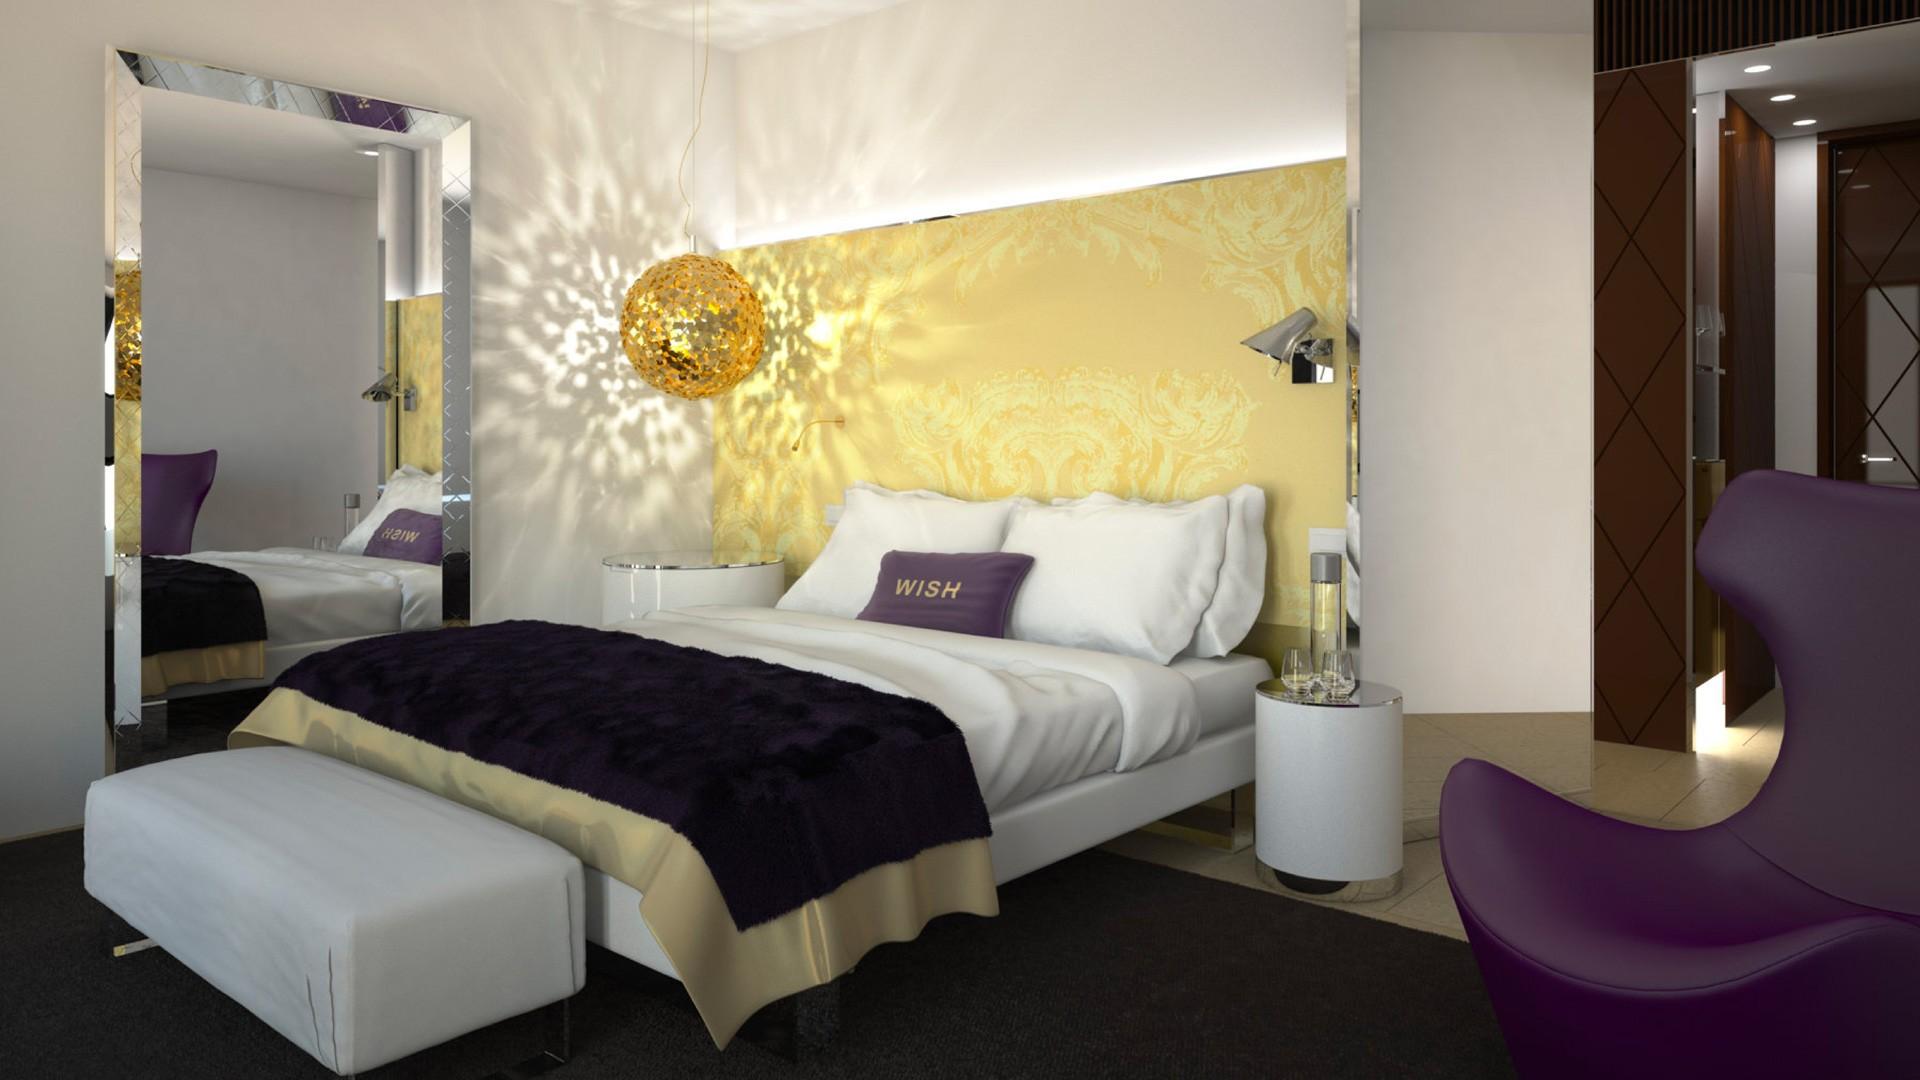 Poliform_contract_hospitality_HOTEL_W_05_1920x1080px_gallery